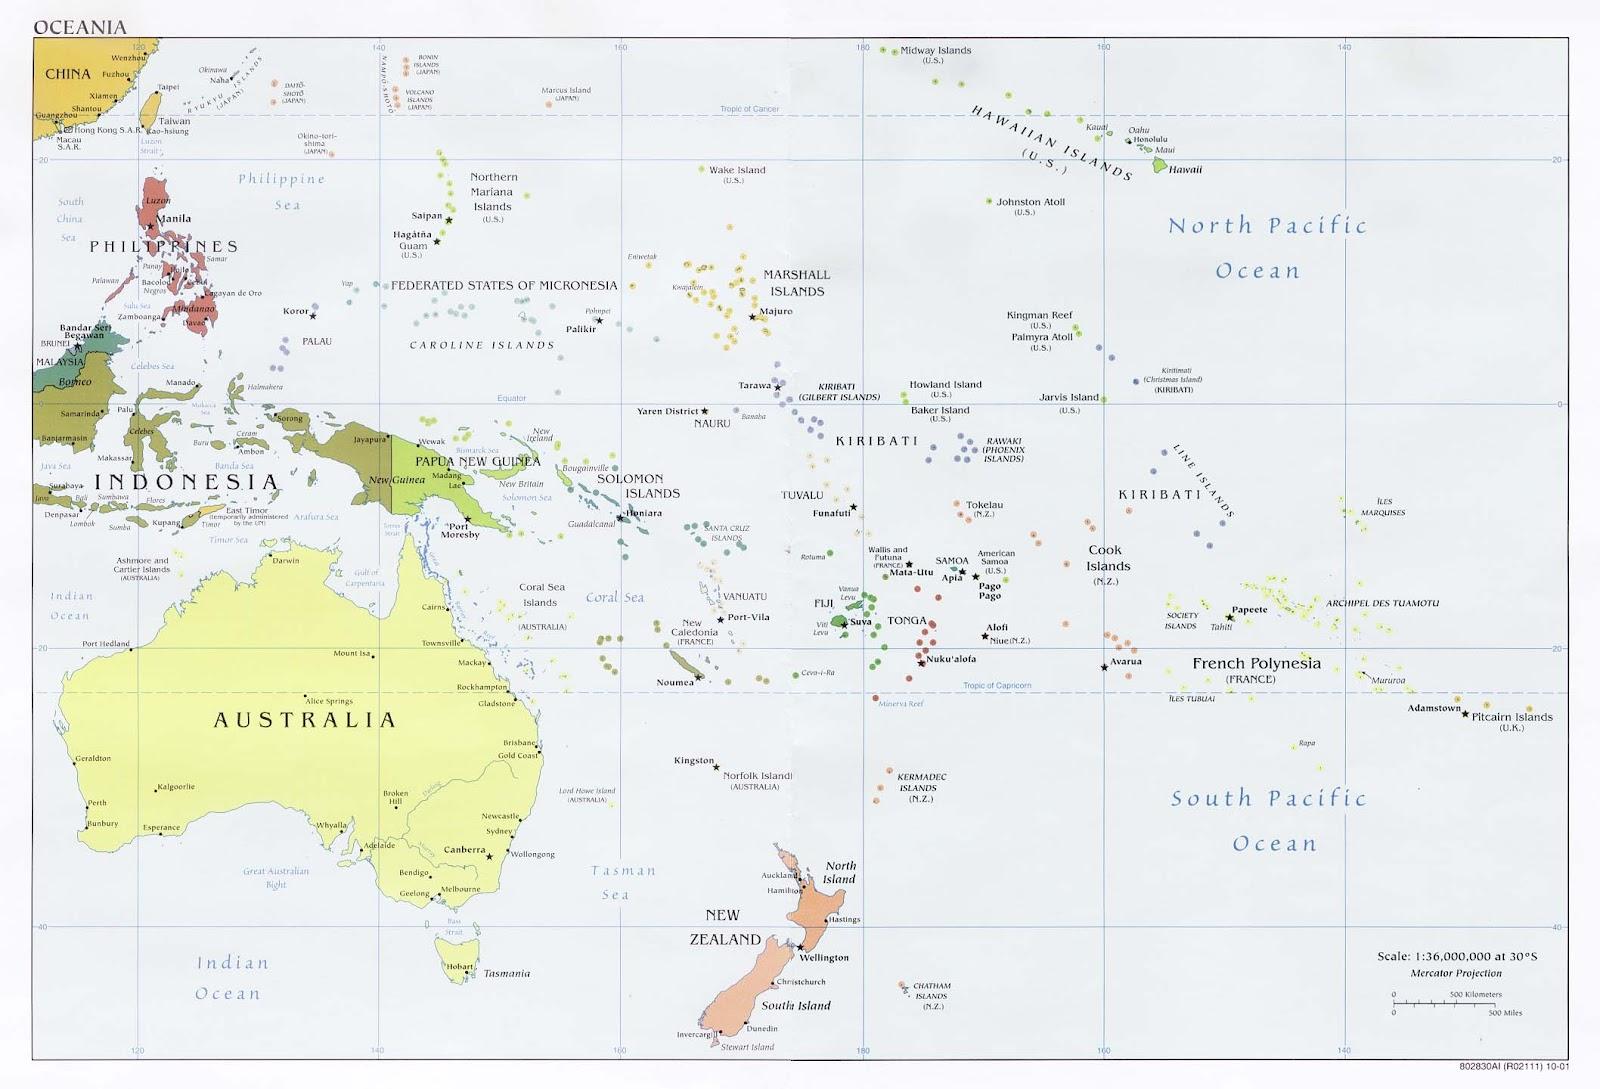 Oceania, Aspectos Geográficos e Sociais da Oceania